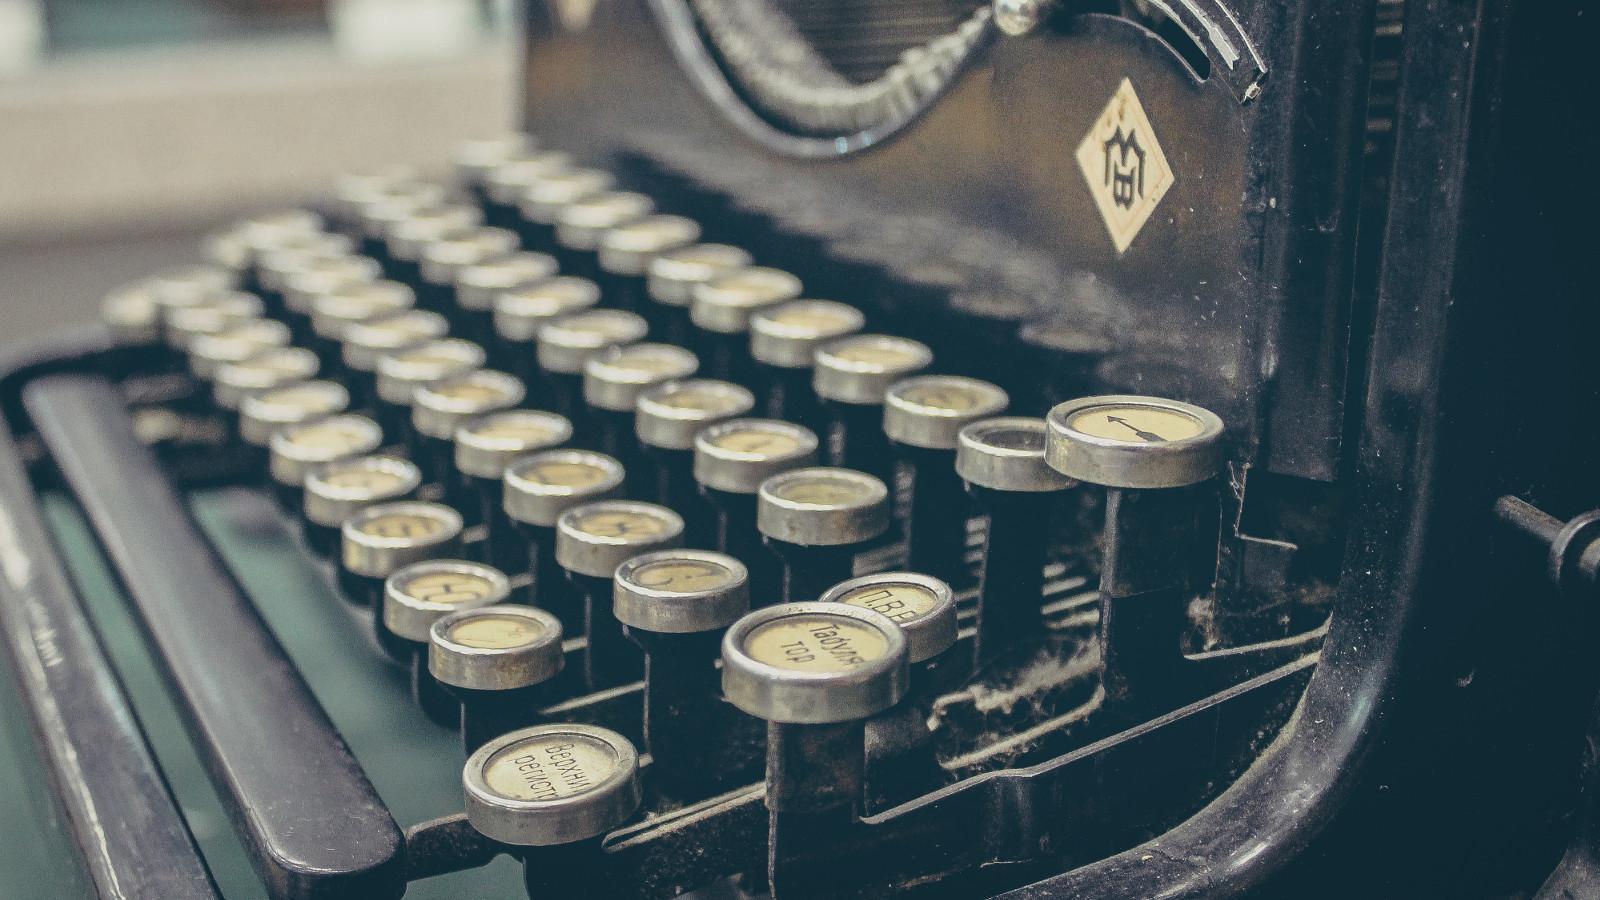 79 frases célebres de un joven cristiano desconocido